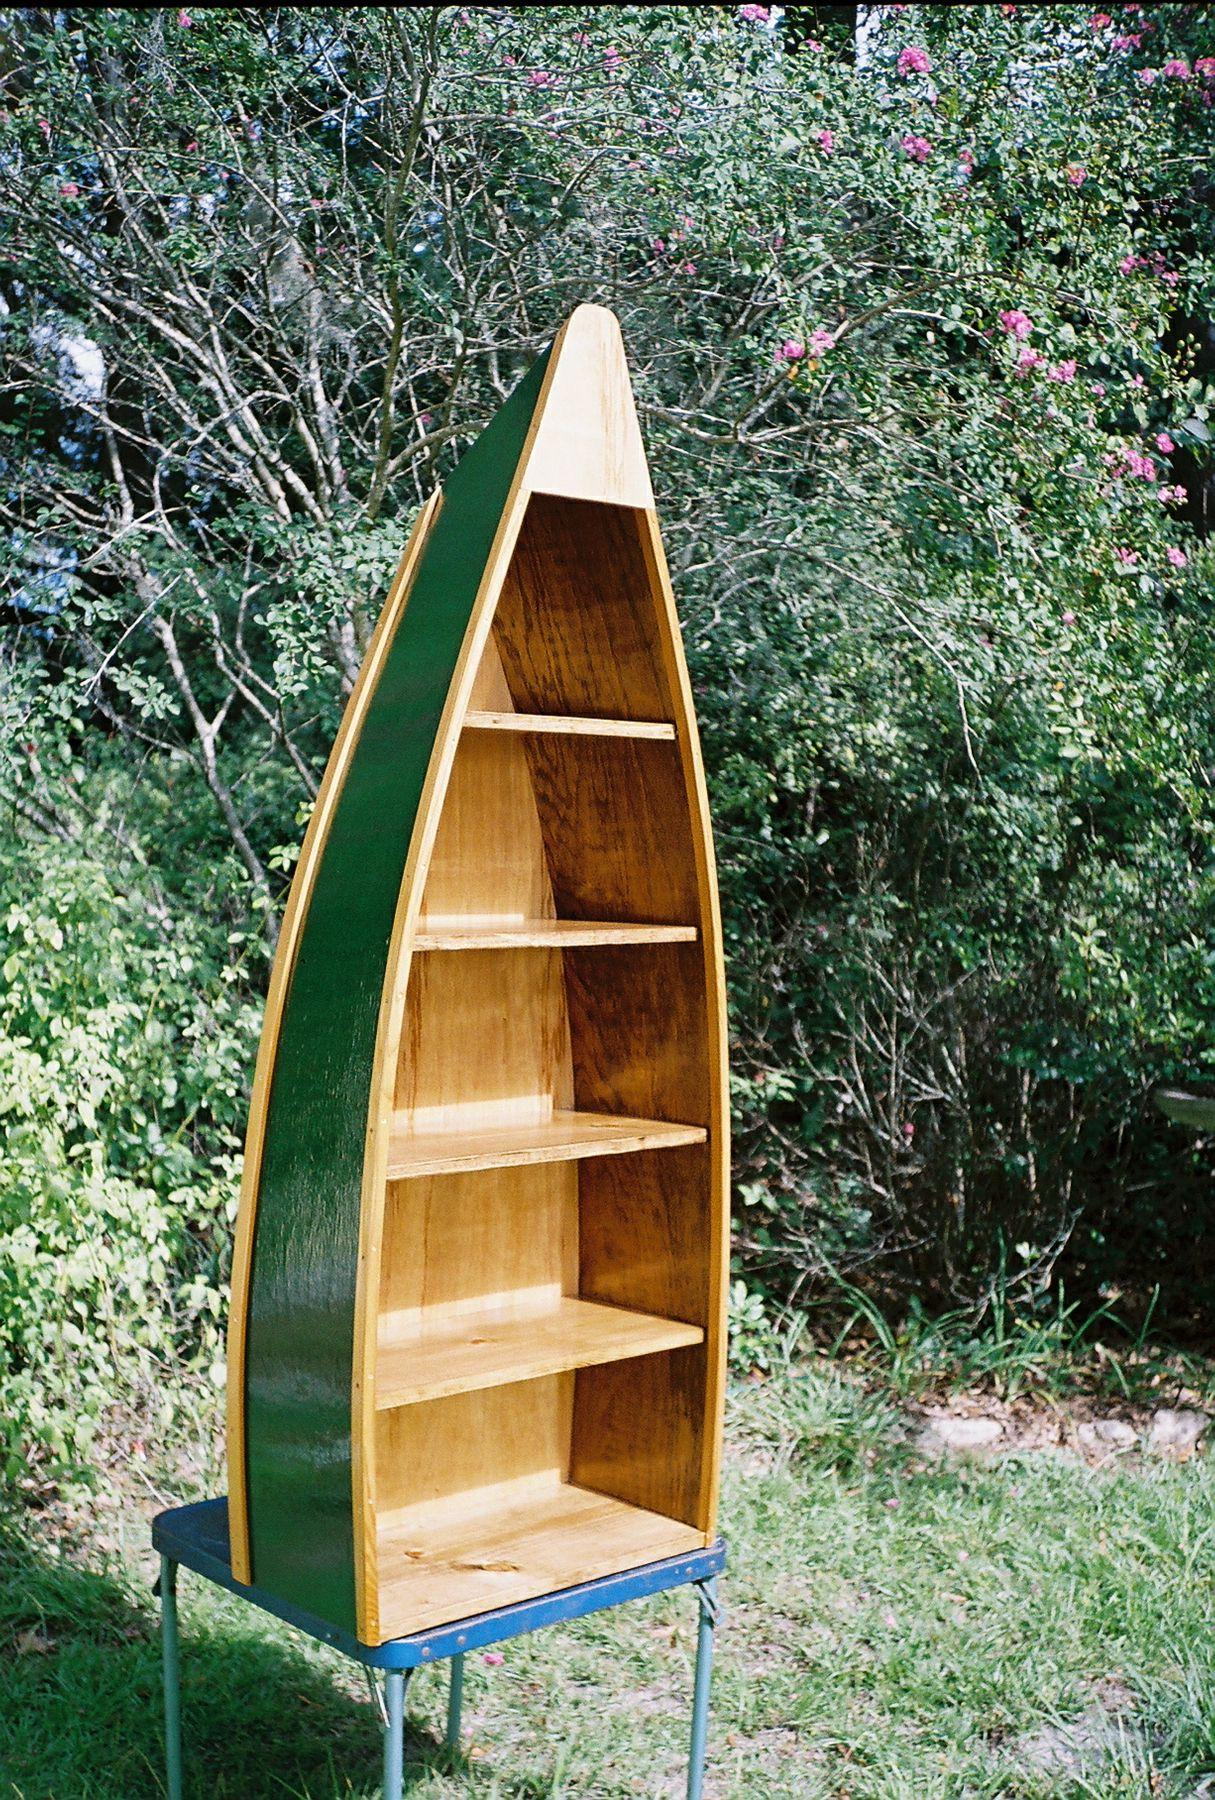 boat bookshelf boat shelves 5ft wide body home dà cor lodge dà cor